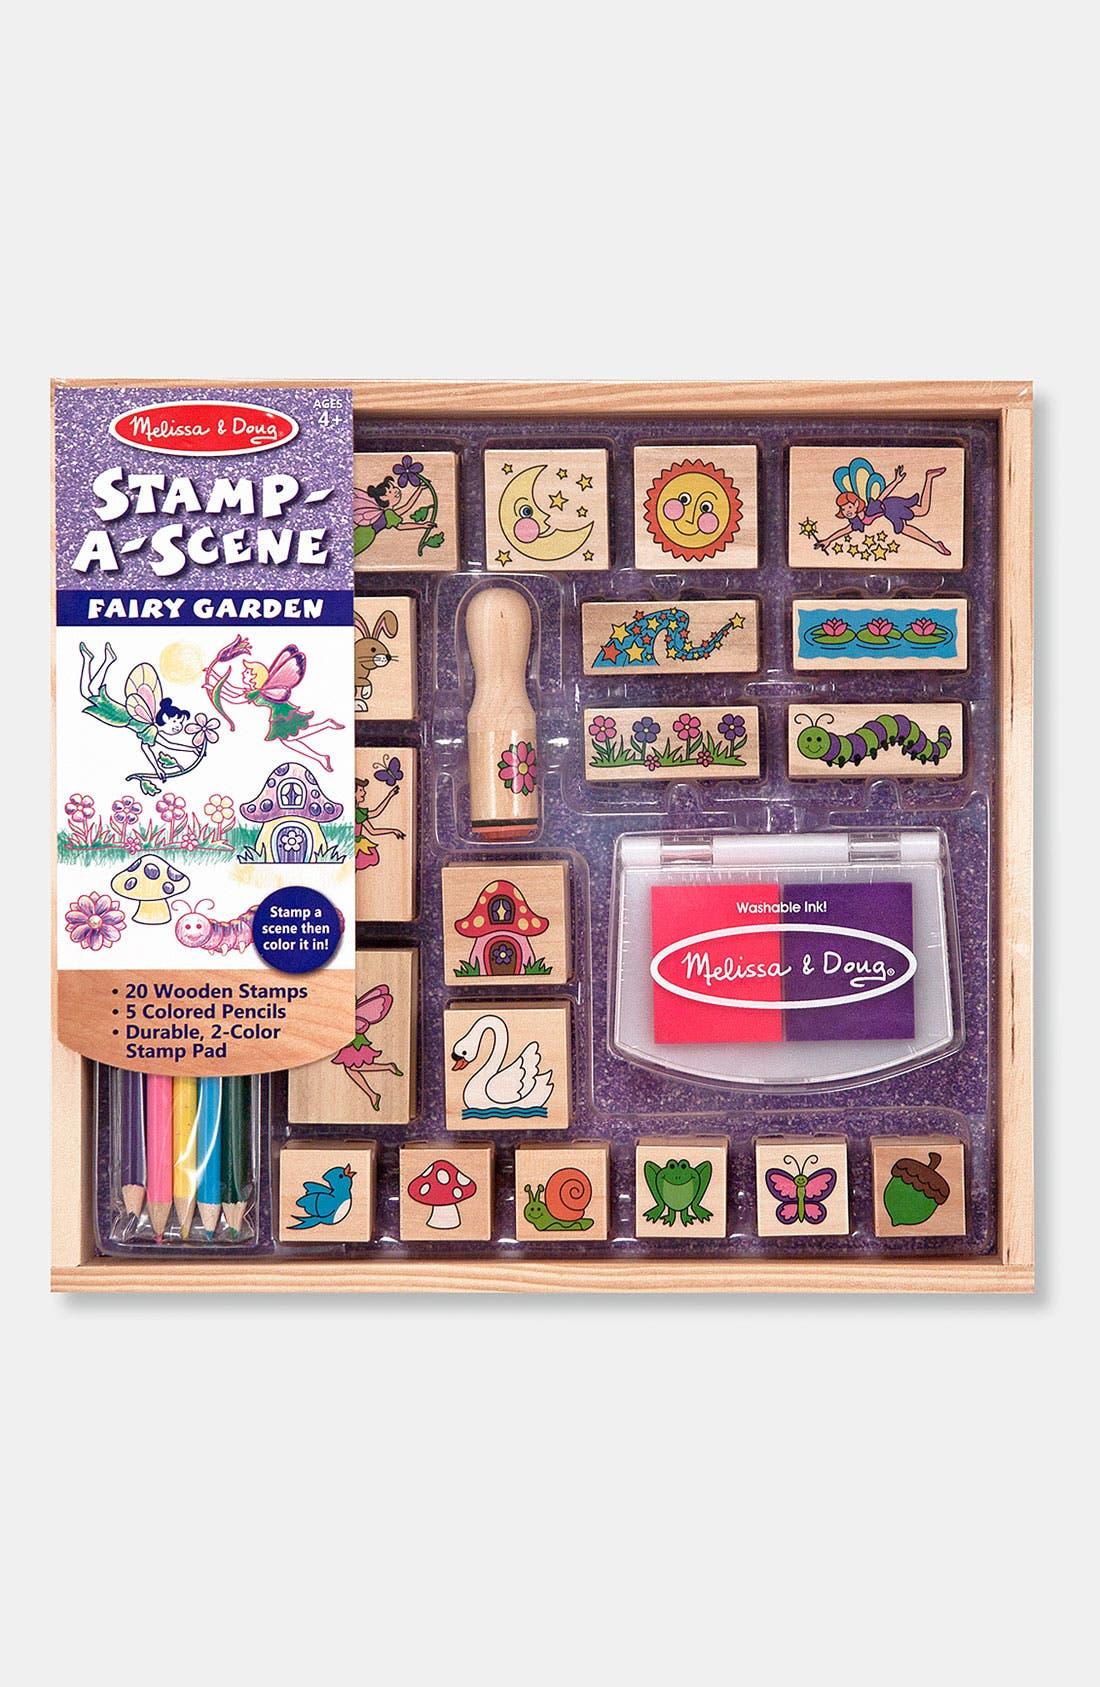 Main Image - Melissa & Doug 'Stamp-A-Scene - Fairy Garden' Stamp Set